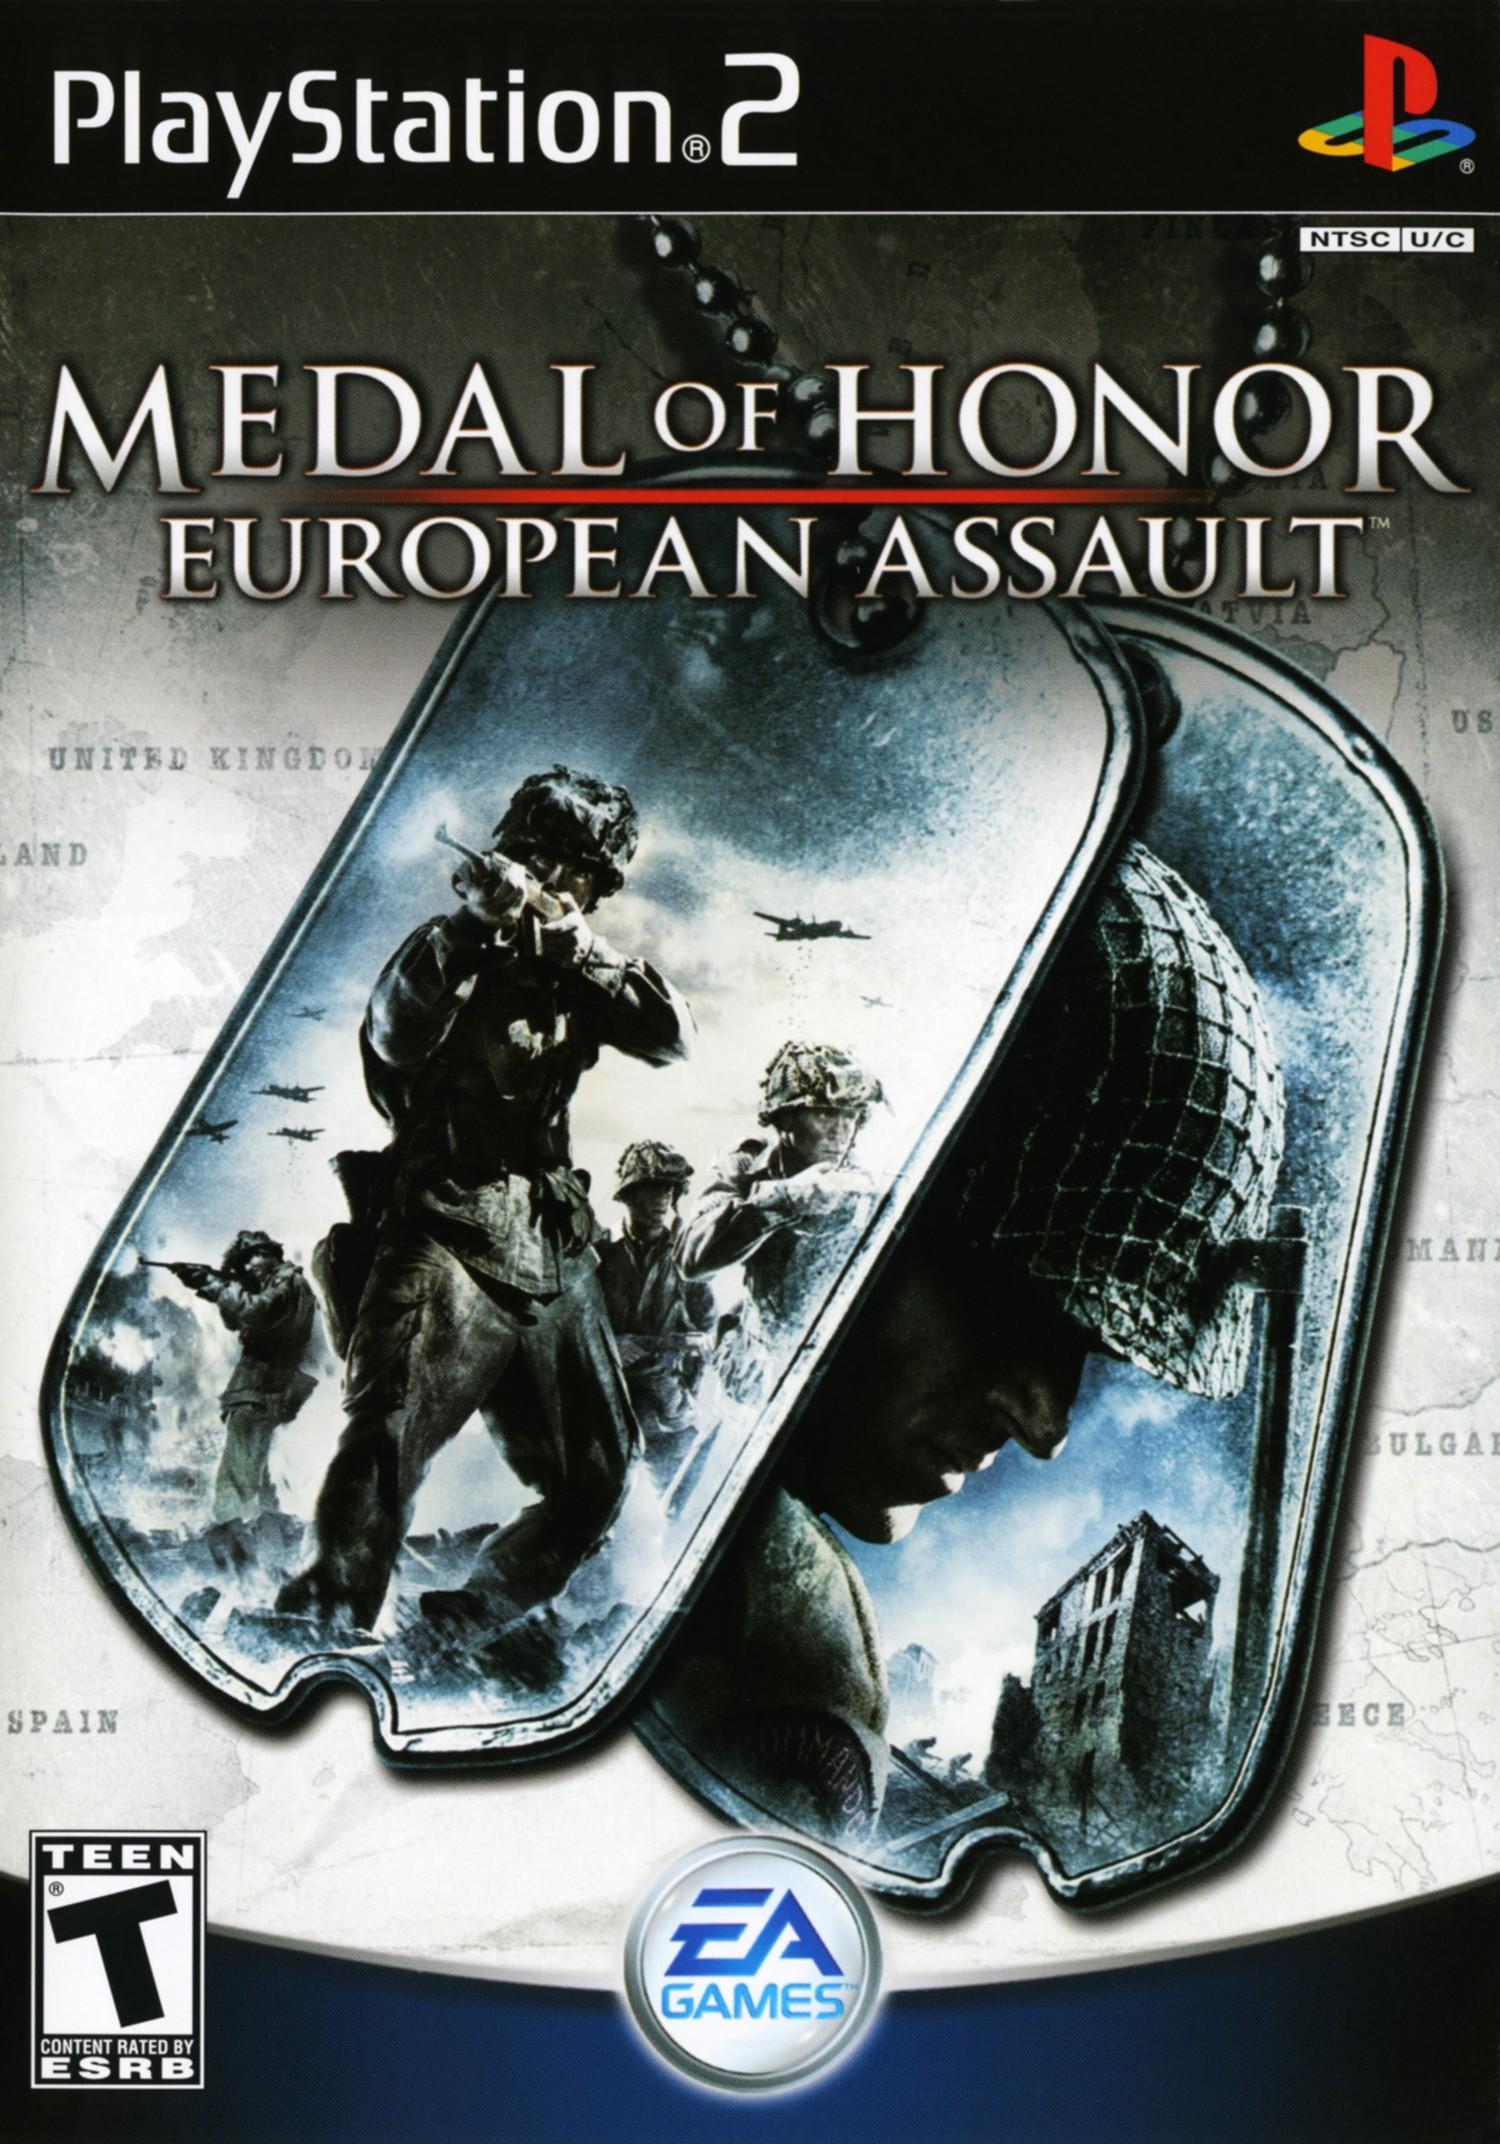 Medal of Honor European Assault